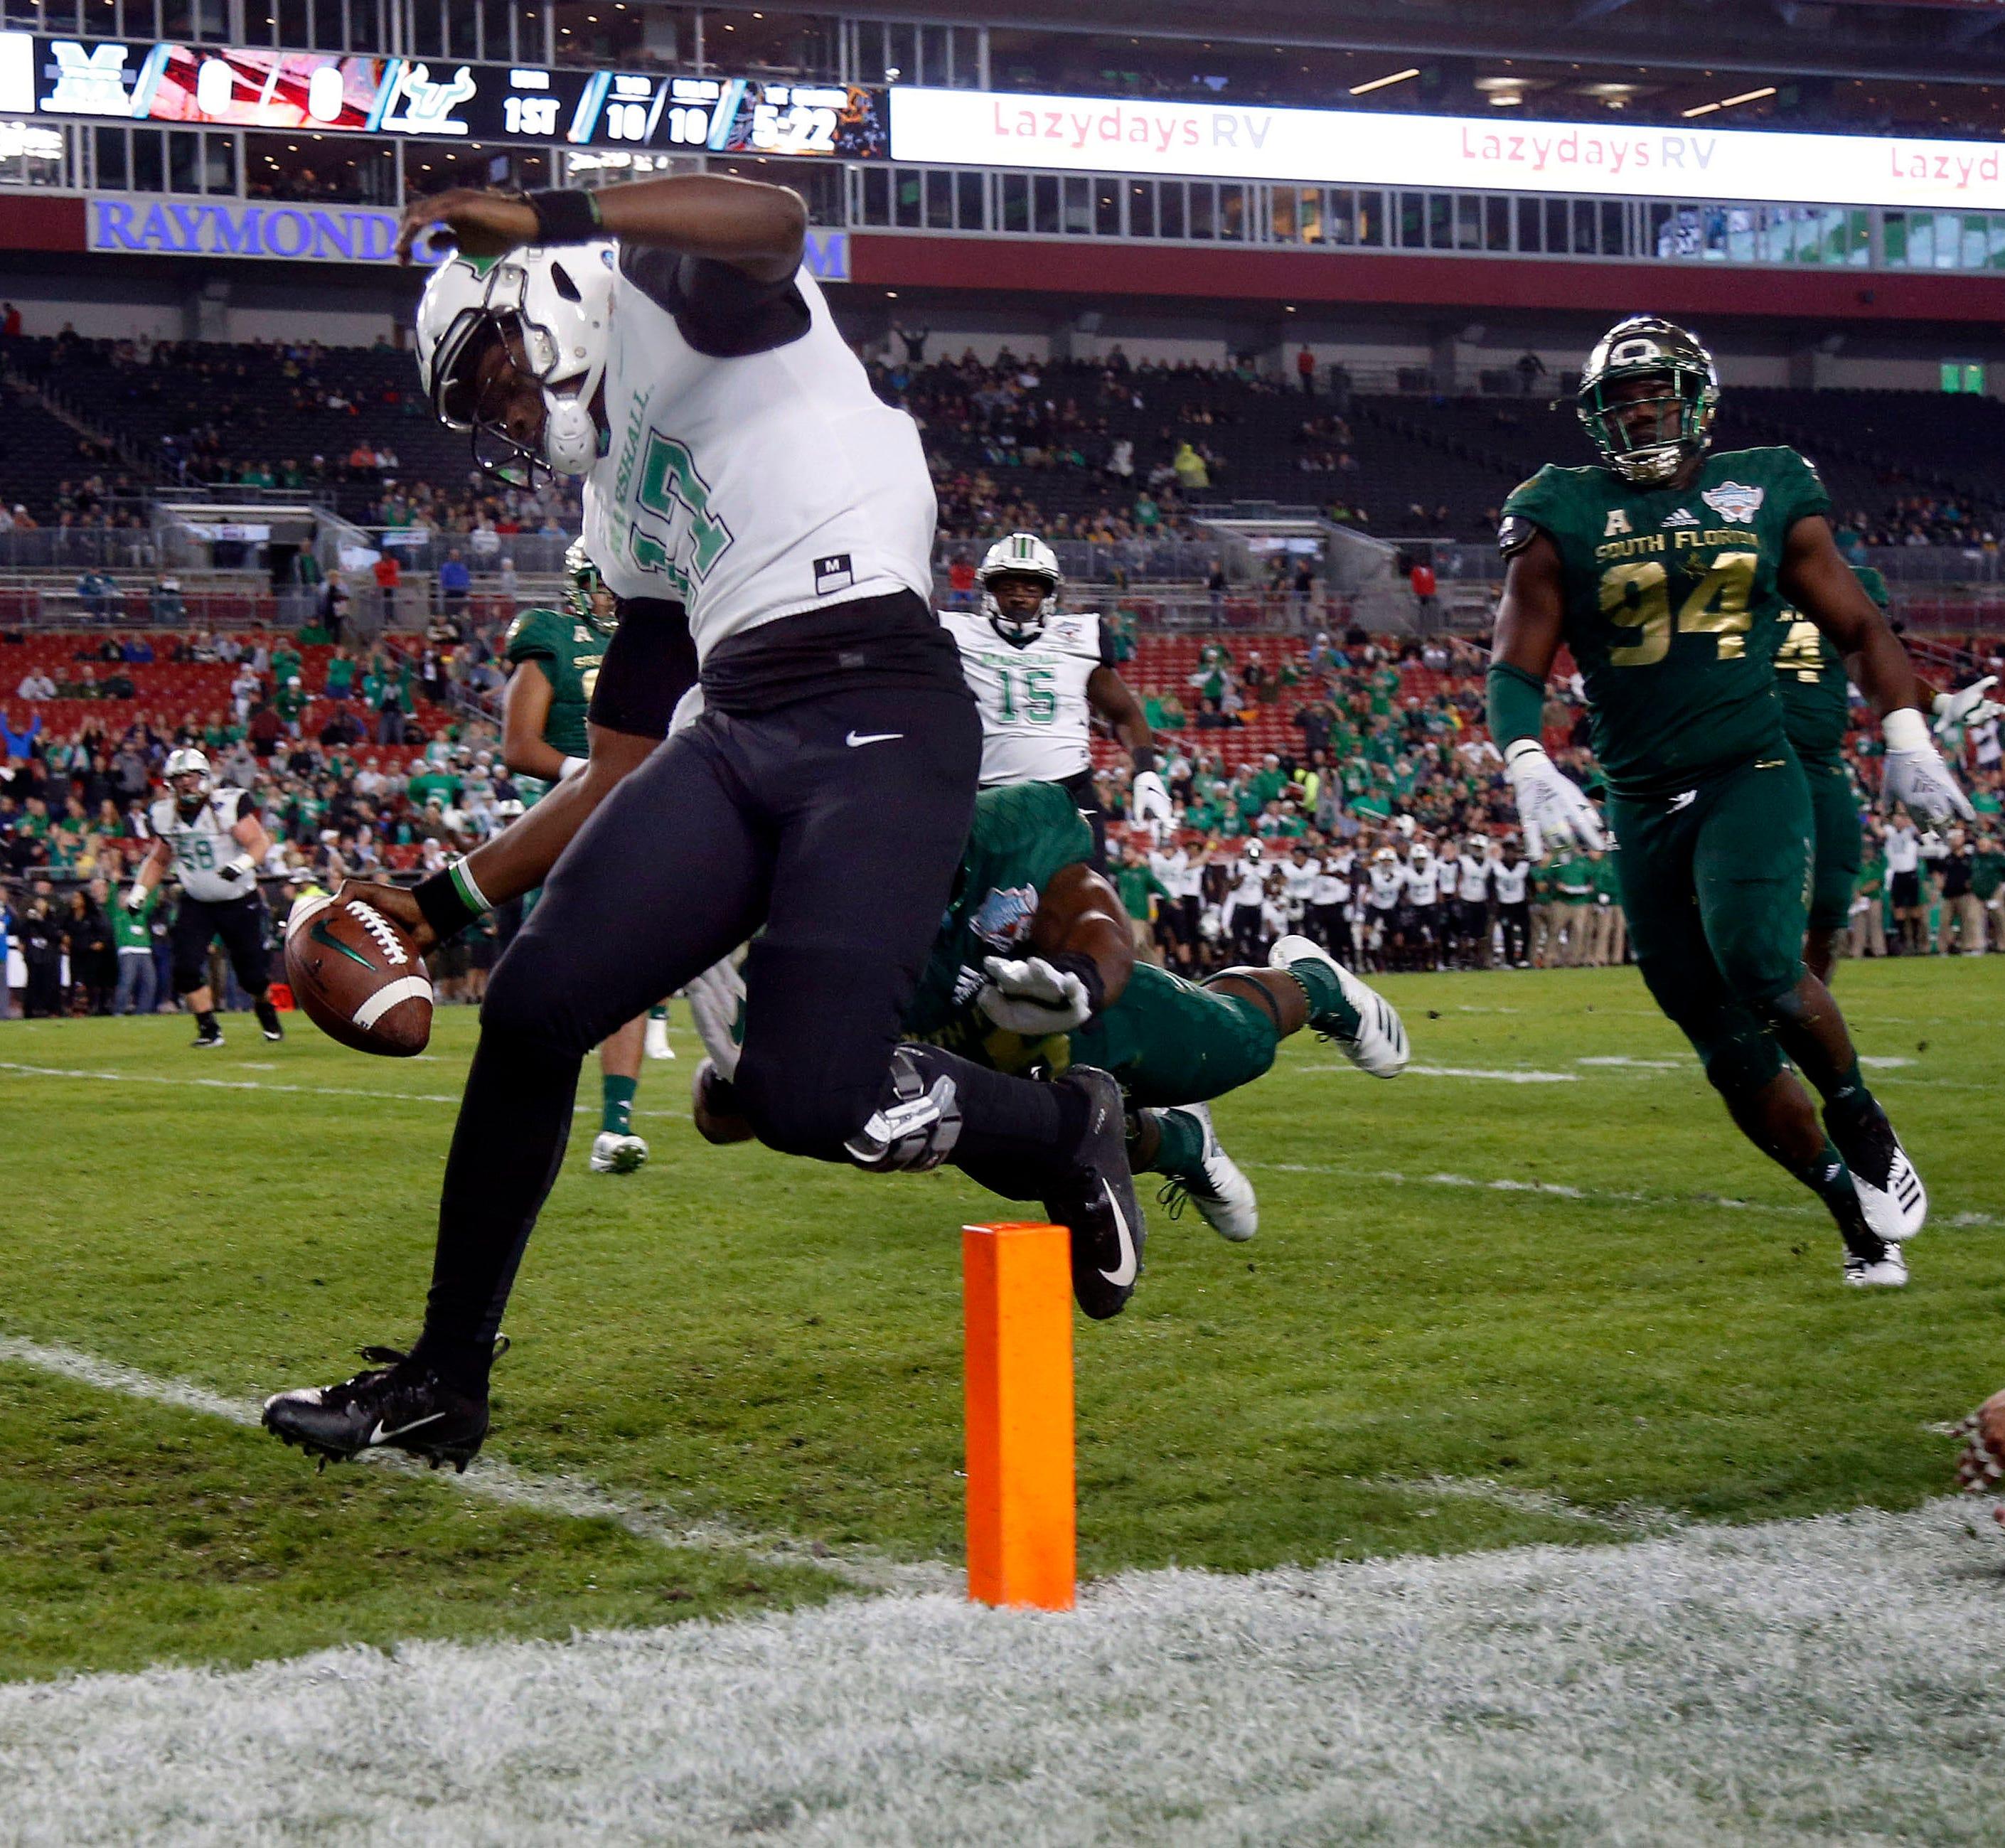 College Football Playoff Clemson Players Fail Drug Test For Ostarine